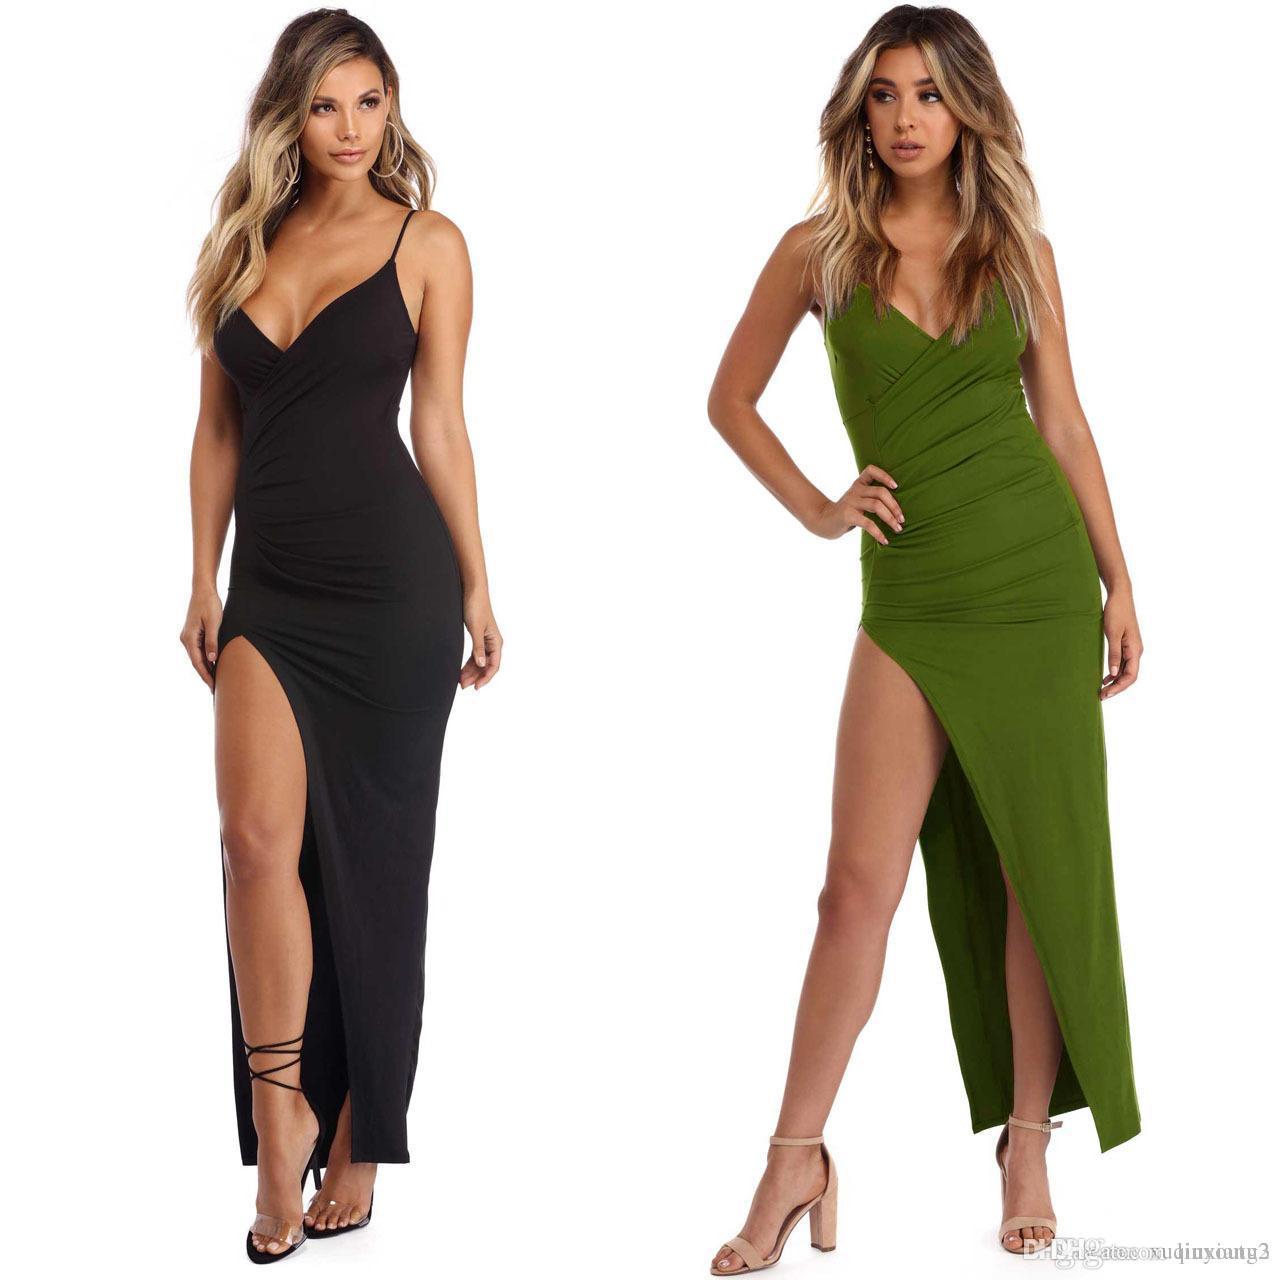 d7f2bdee32 Maxi Party Dress Women Pink Plunge Neck Sexy Cross Back Wrap High Slit  Summer Dresses Elegant Club Long Cami Dress Women Floral Dress Ladies Nice  Dresses ...